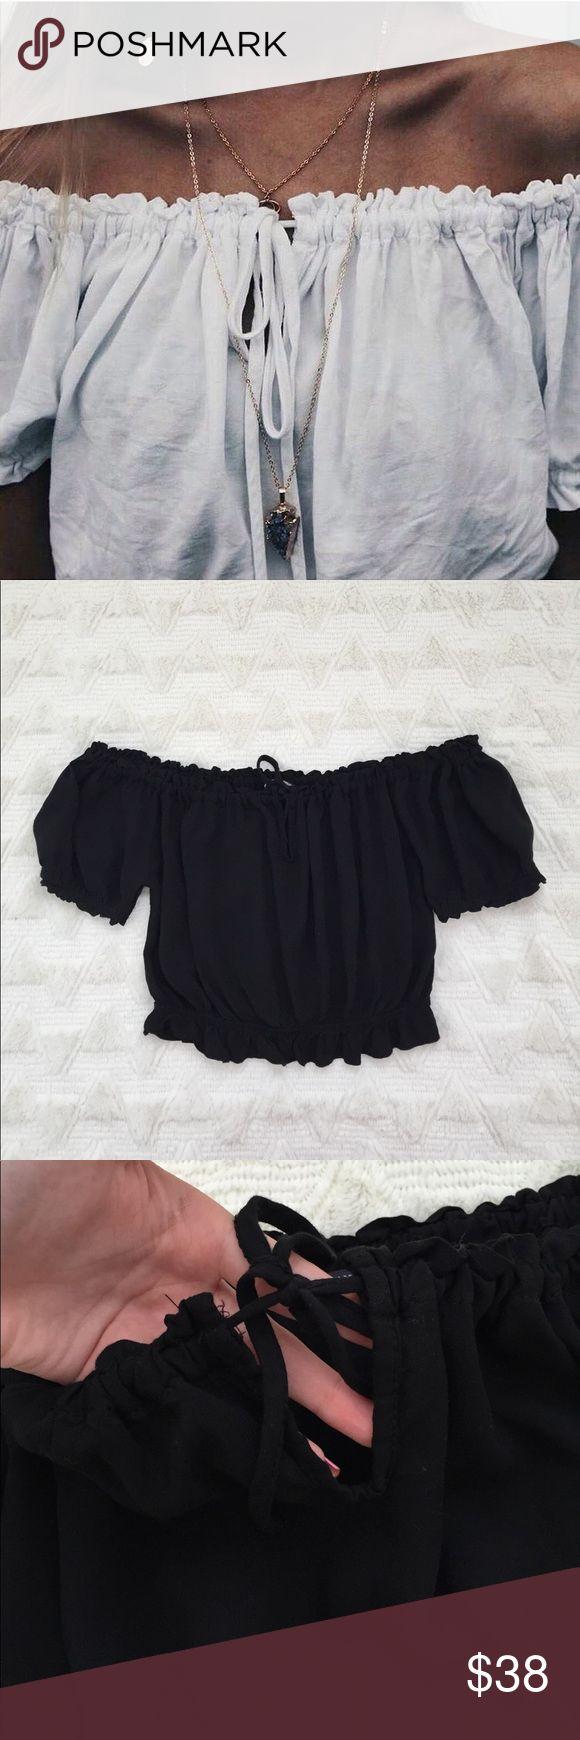 Bnwot Brandy Melville top Brand new never worn Brandy Melville Tops